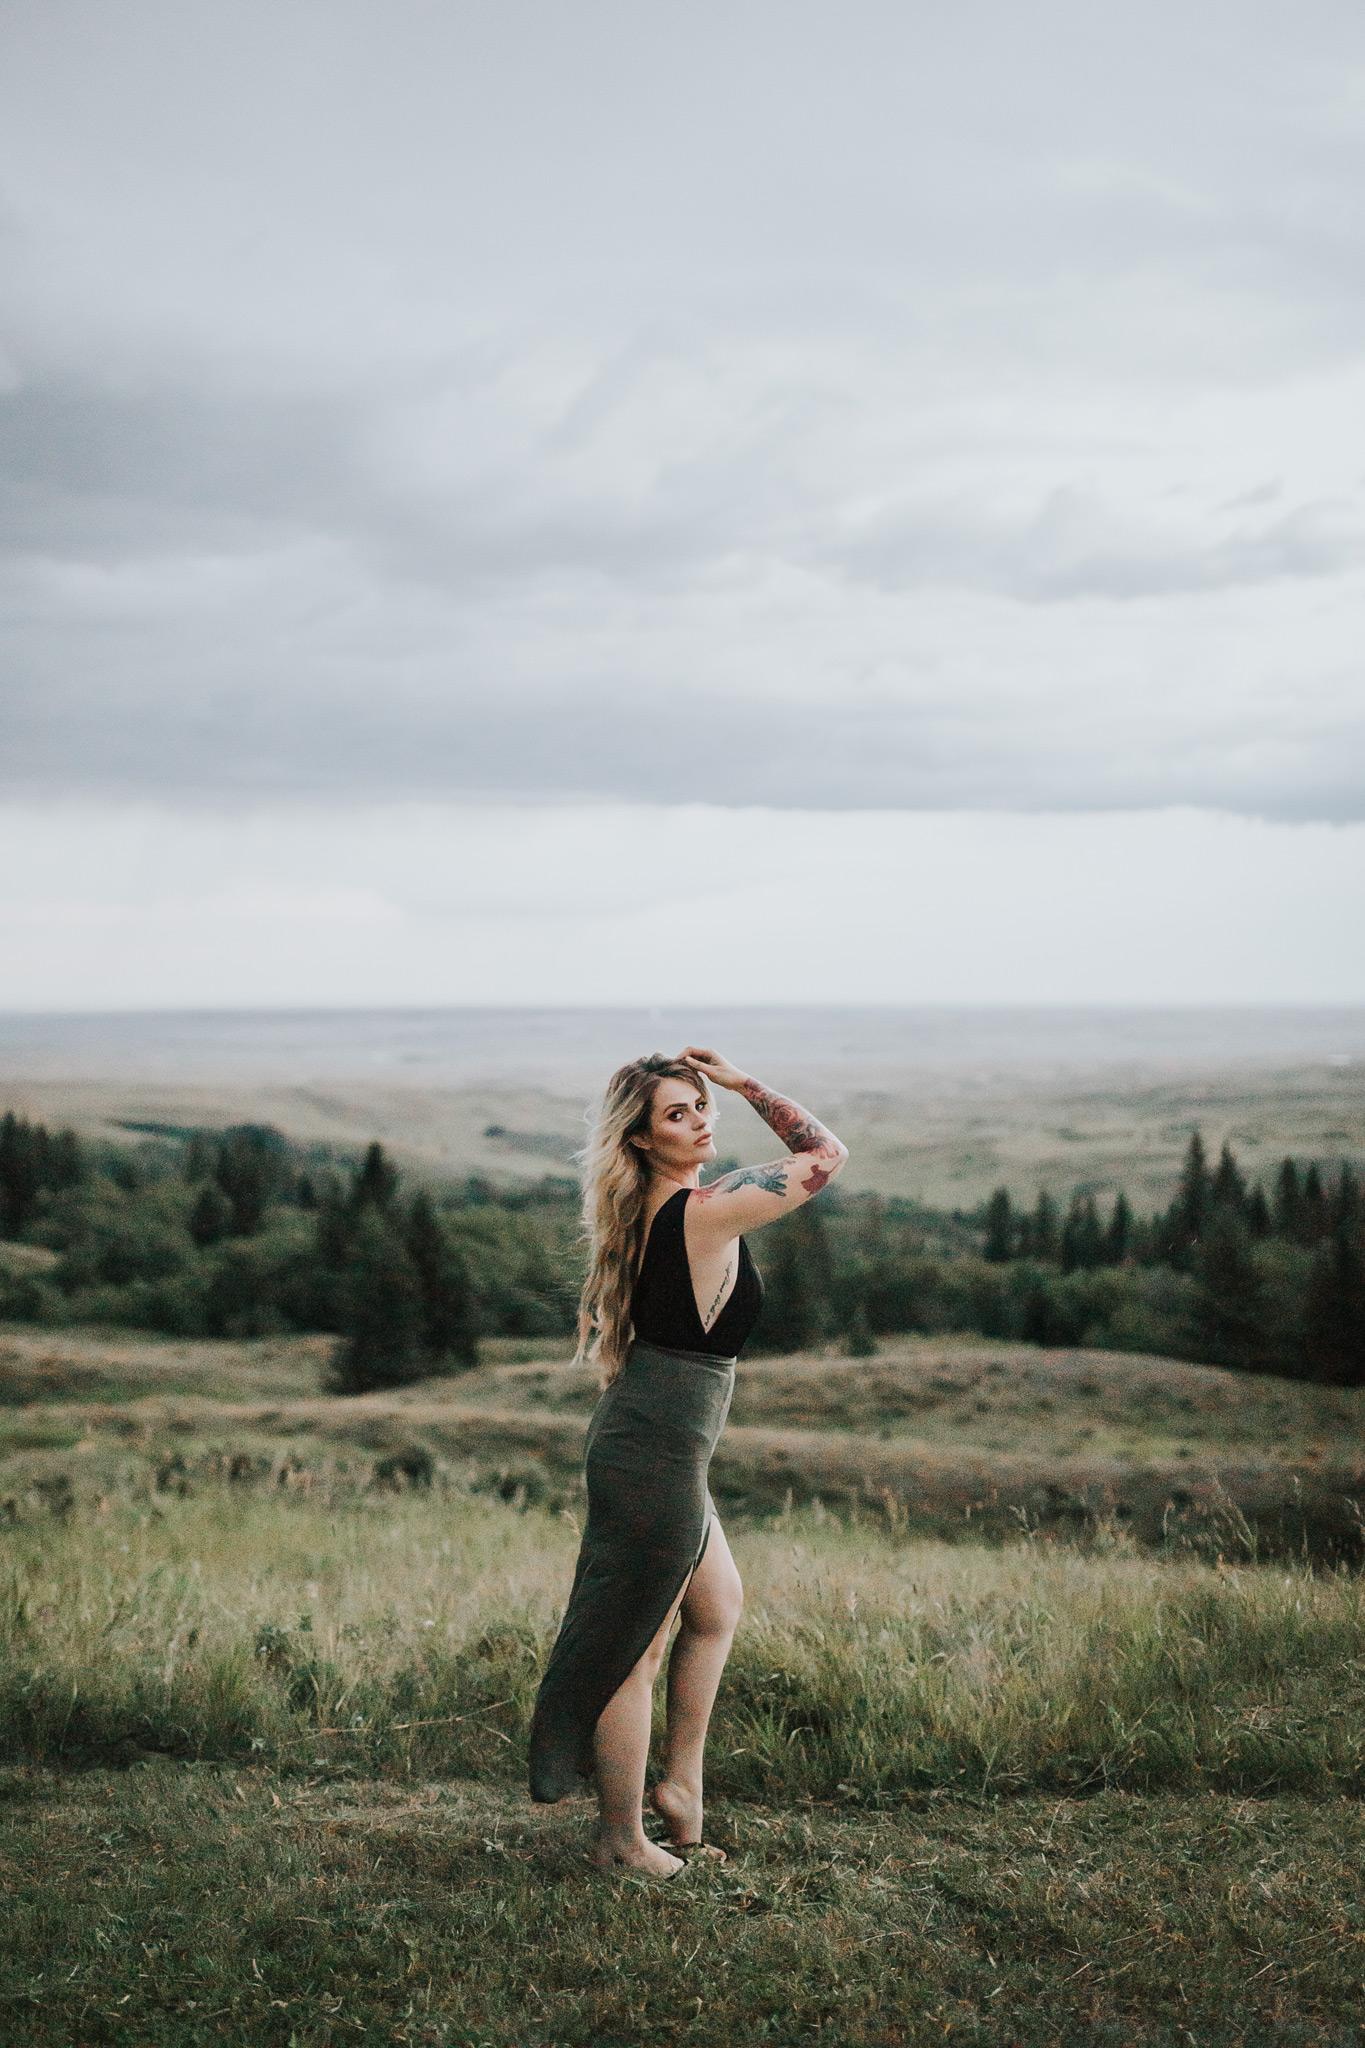 woman posing in front of reesor lake view